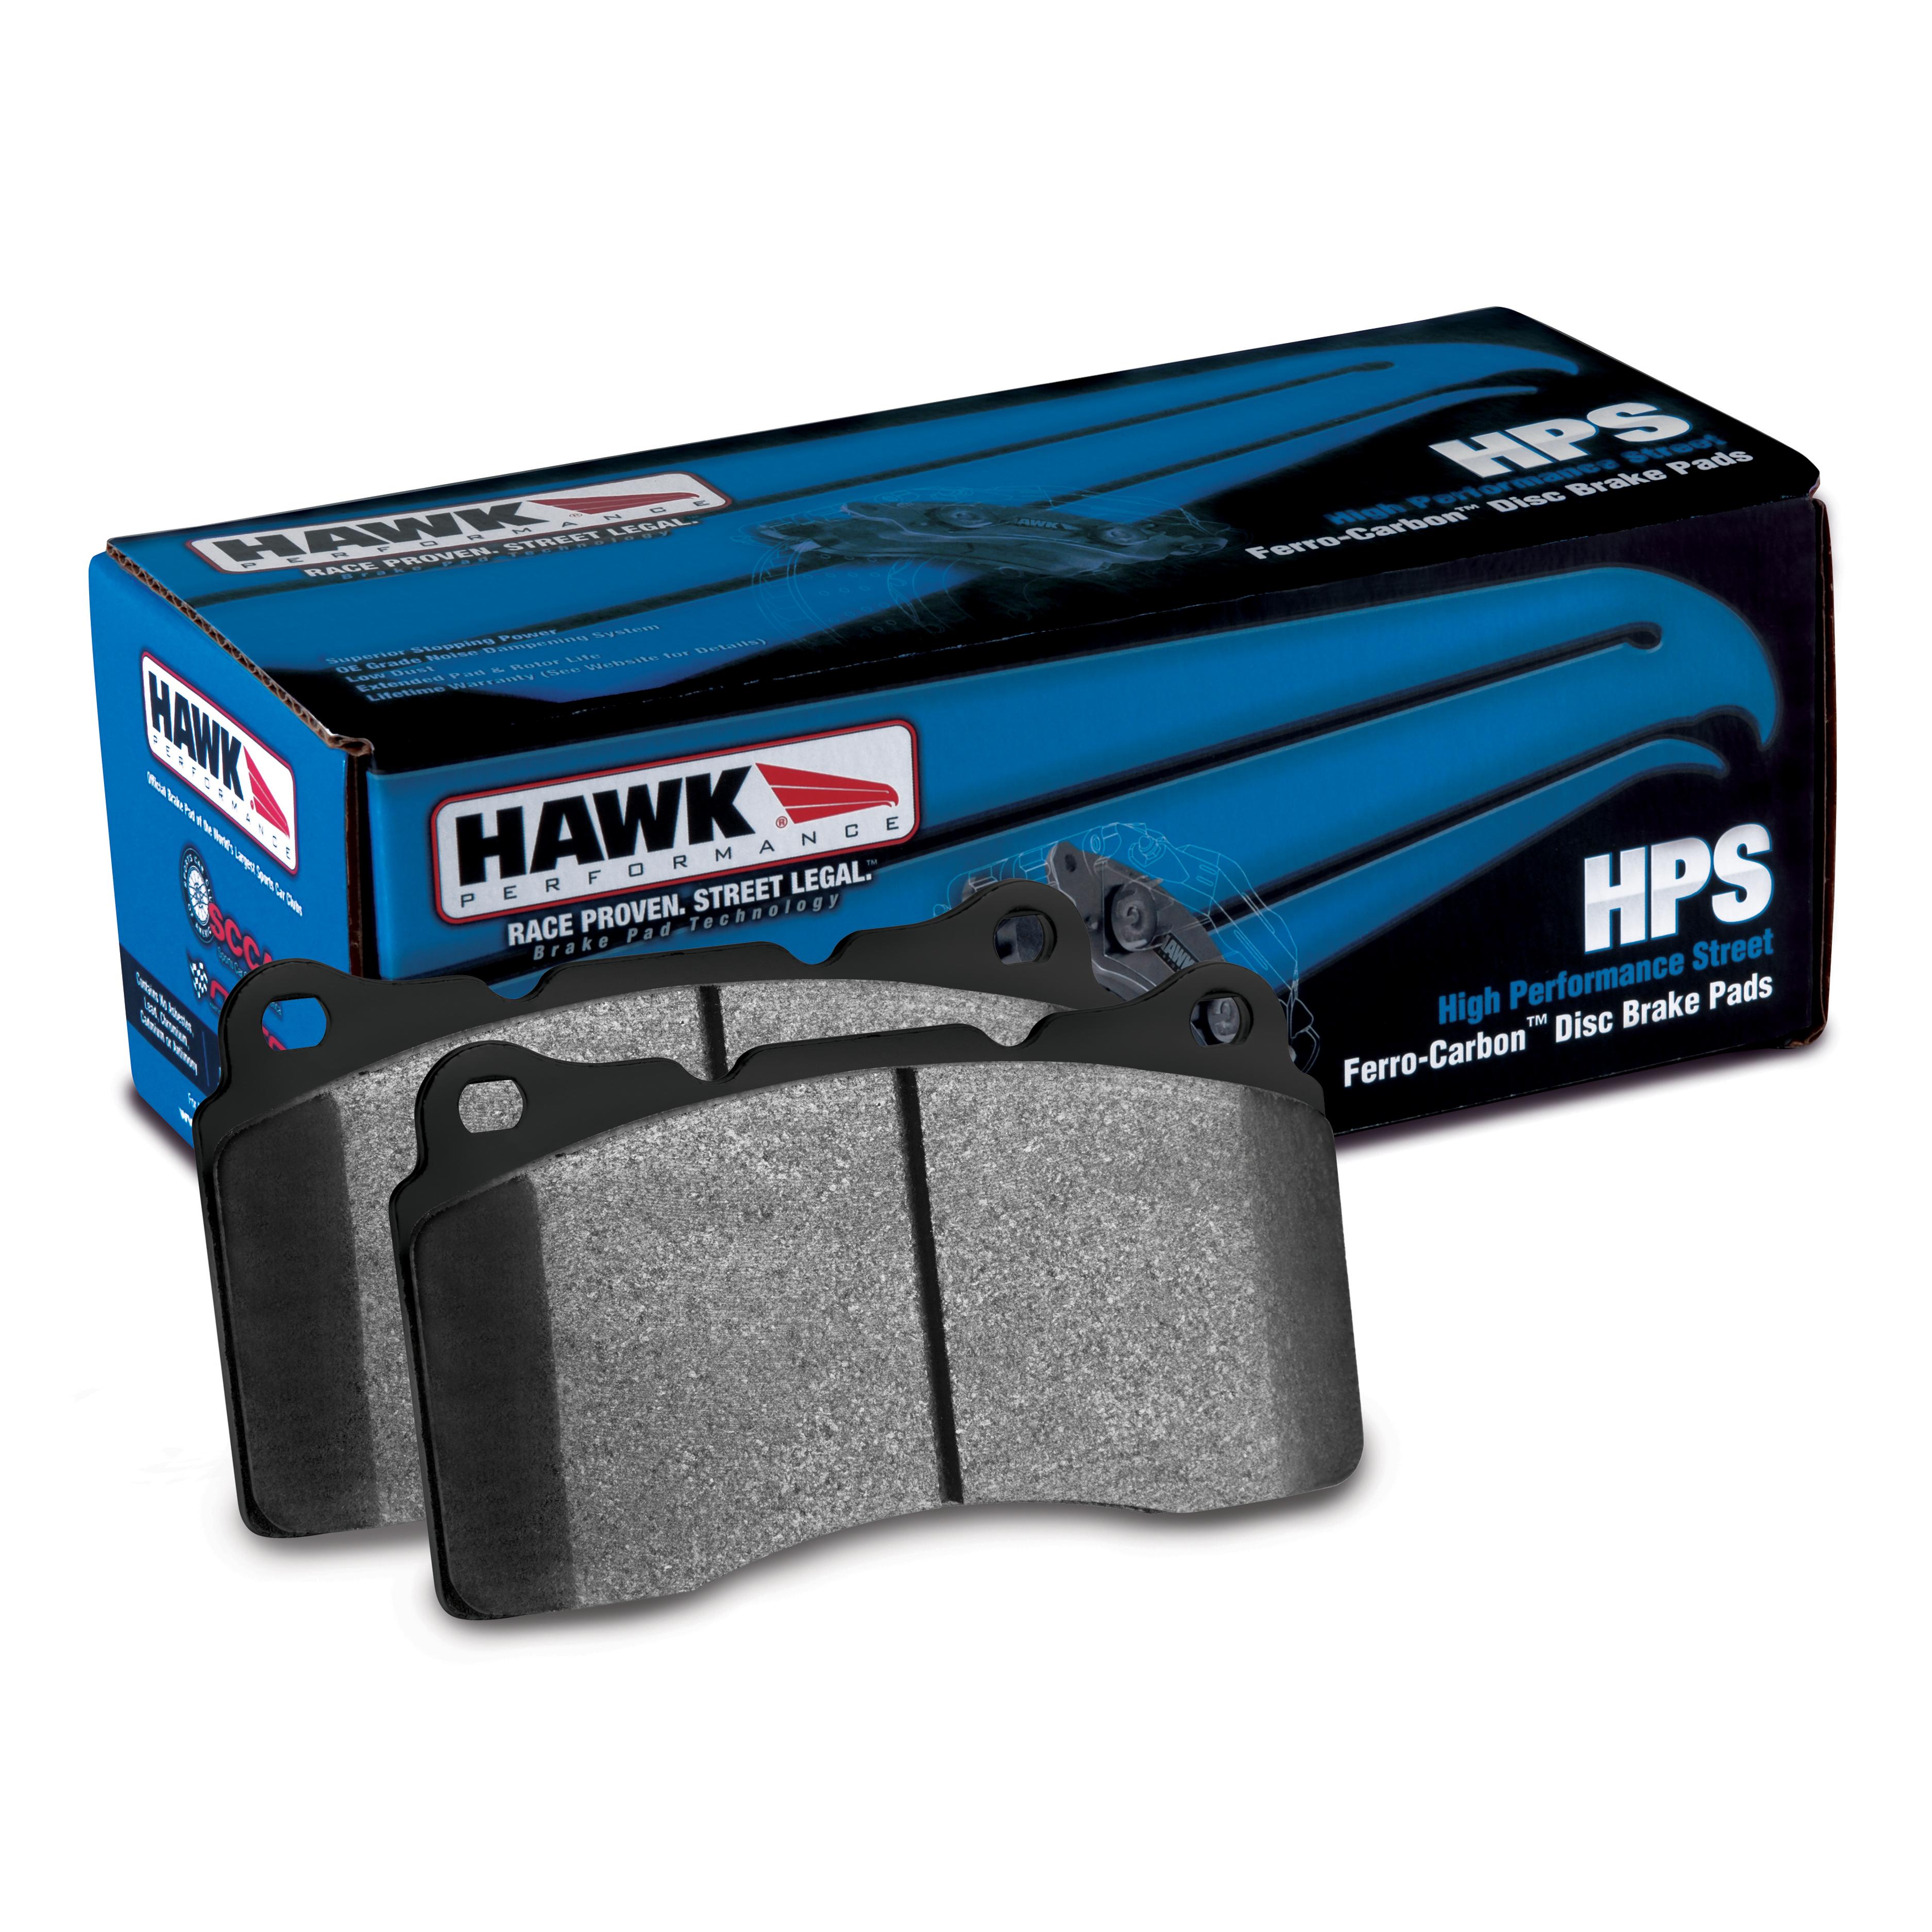 2004-2014 Mustang HPS Front Brake Pads HB453F.585 Hawk